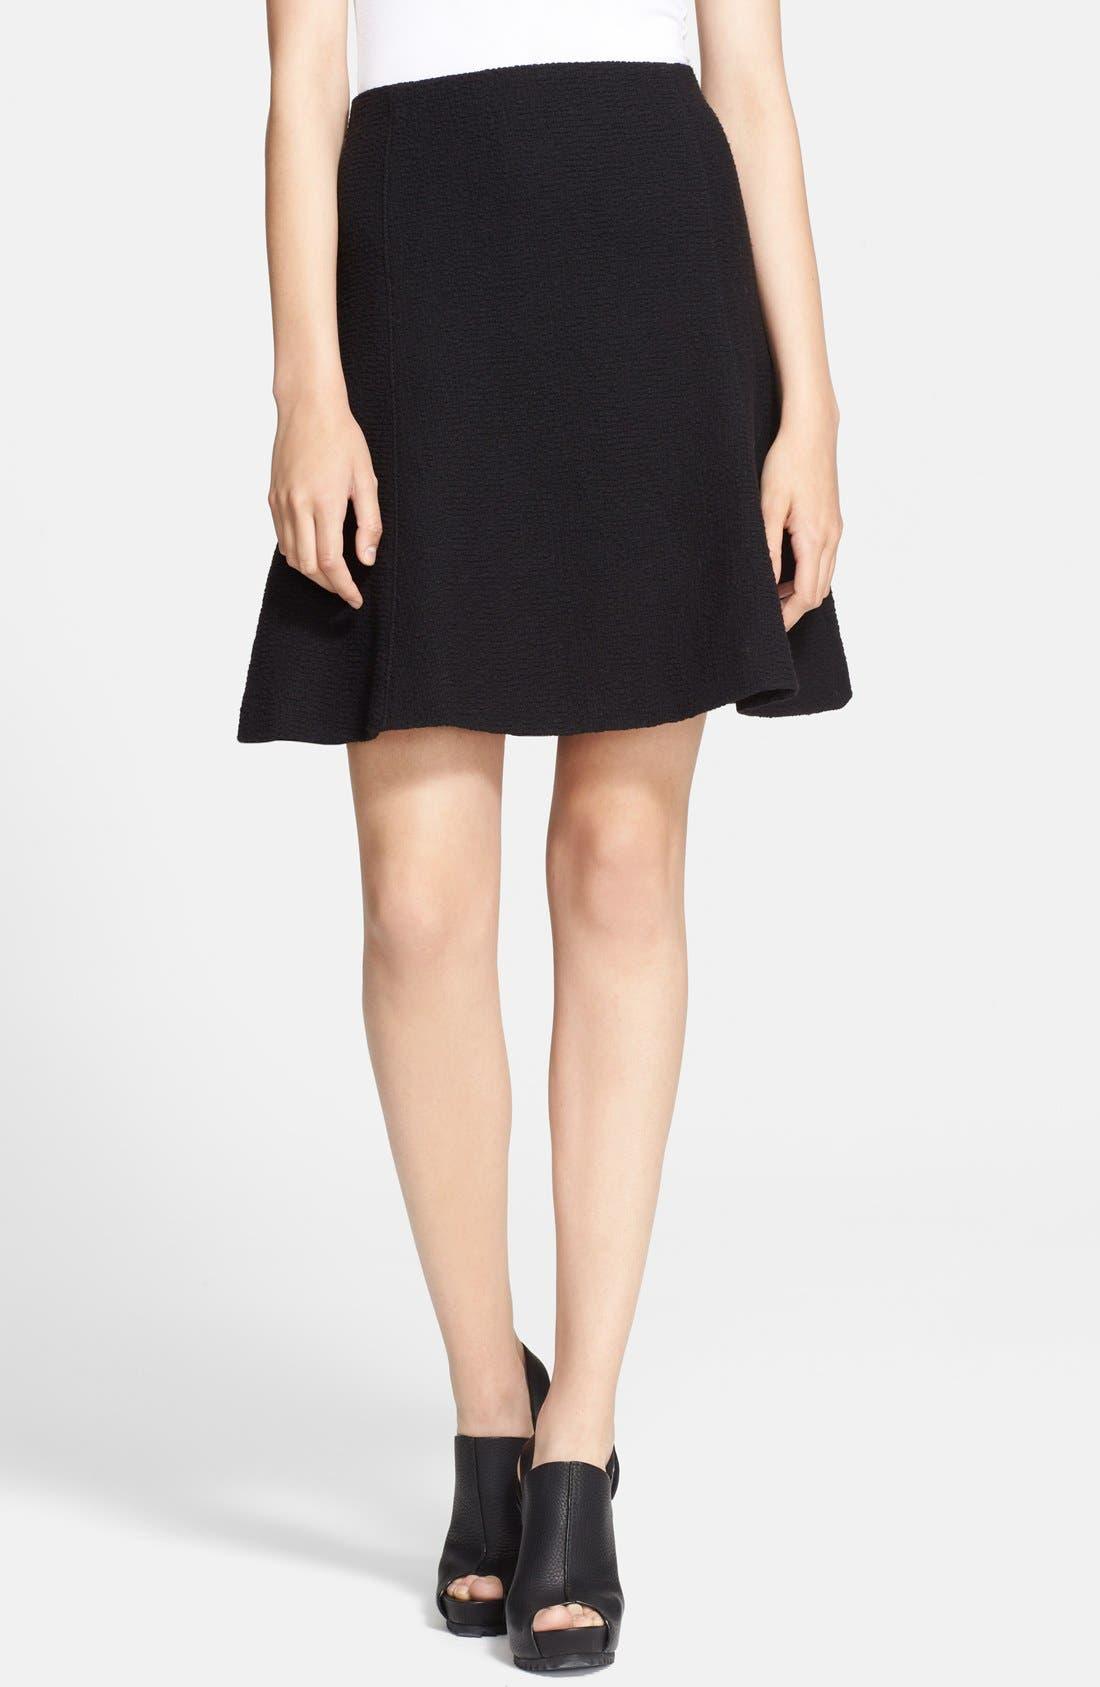 Alternate Image 1 Selected - Carven Textured A-Line Skirt